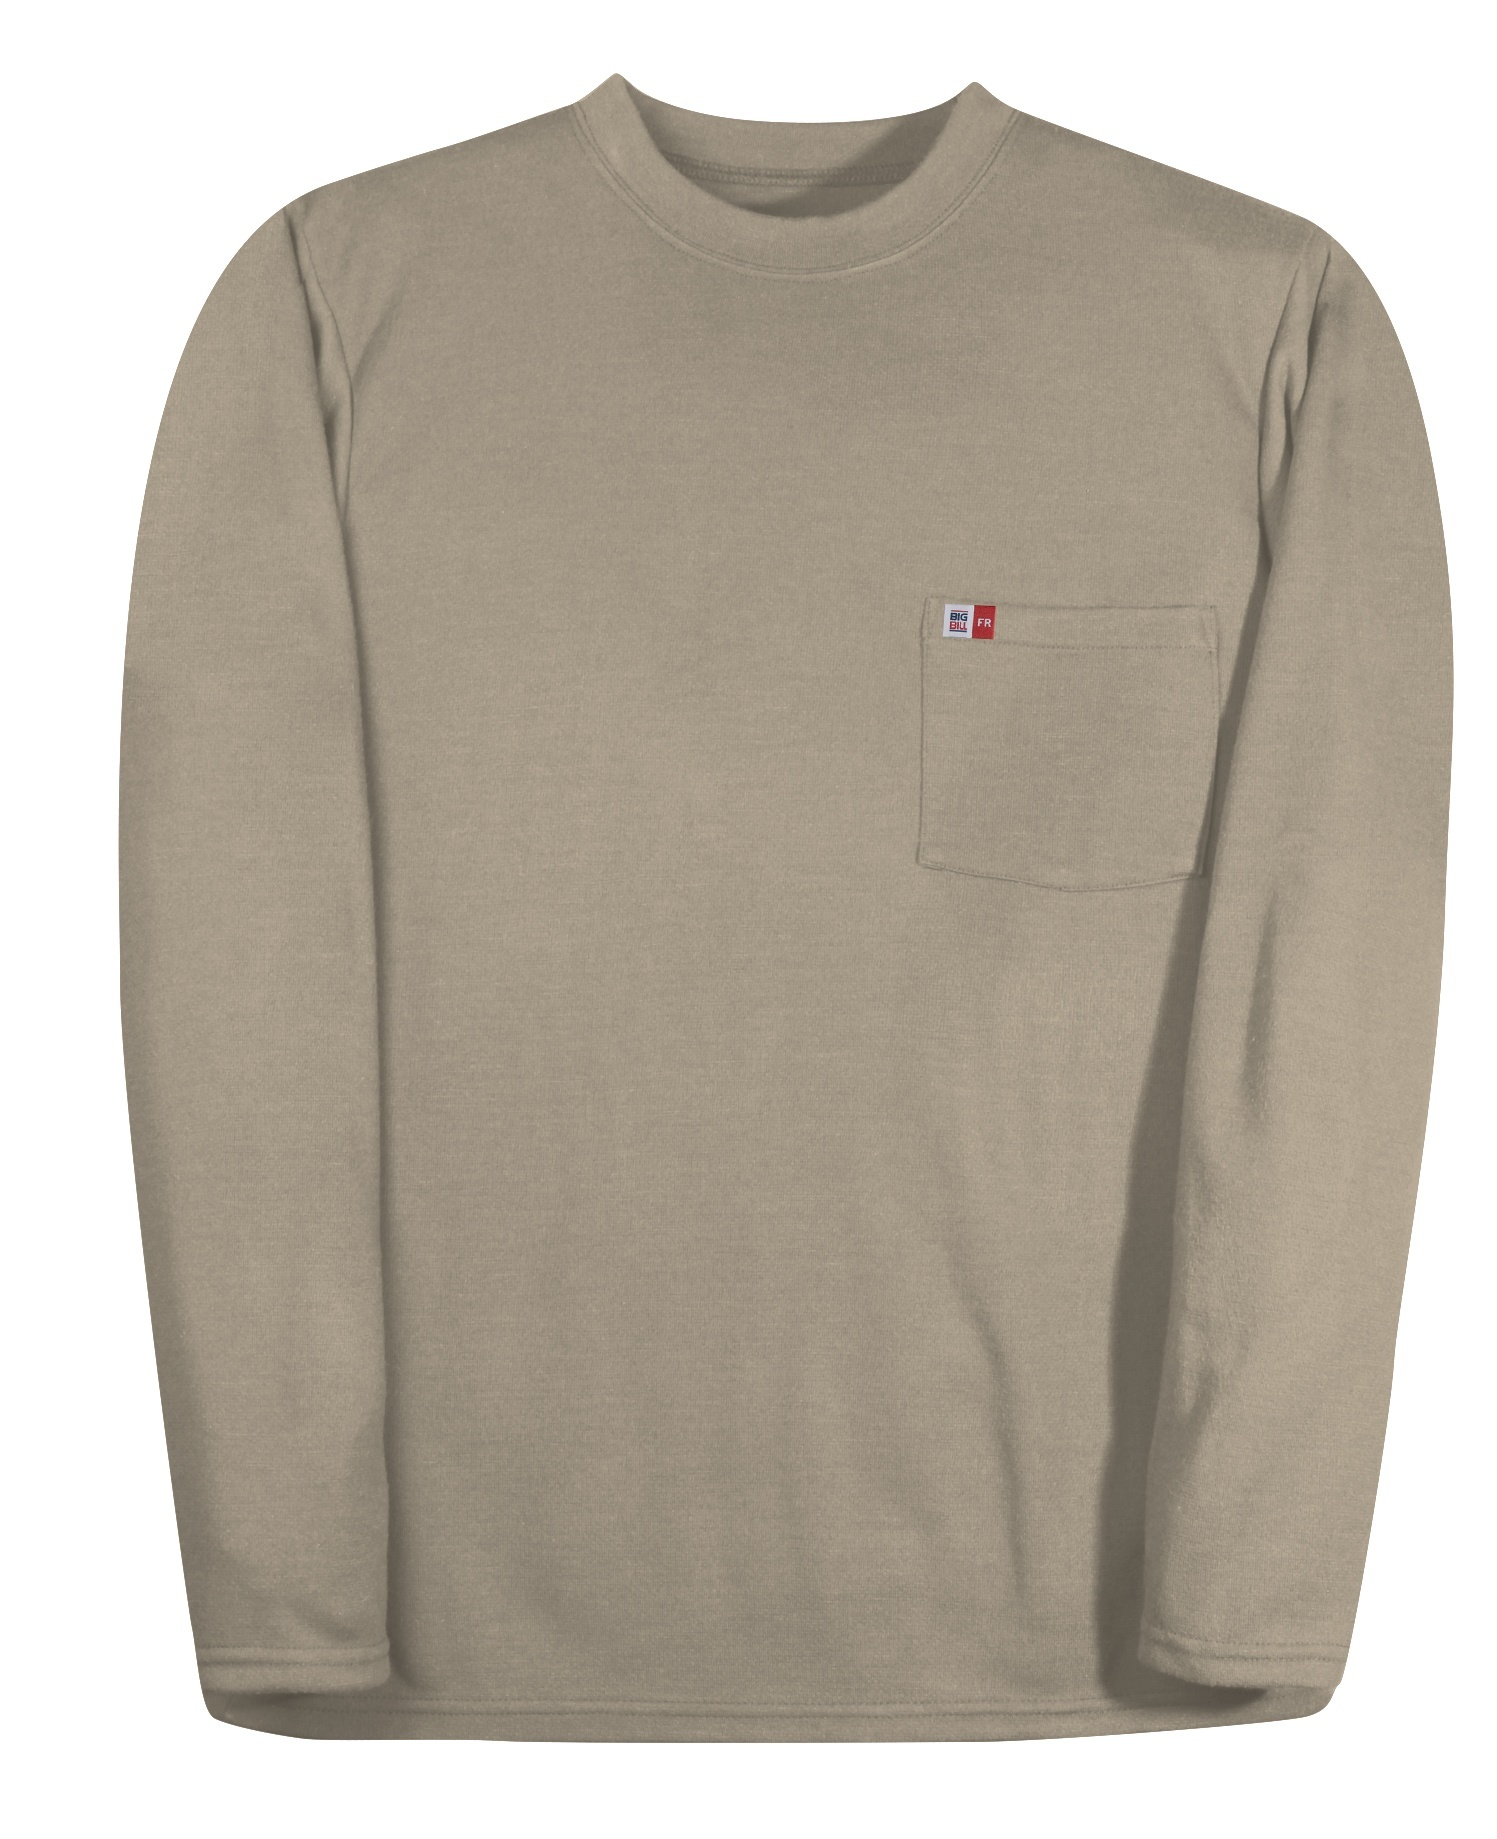 6.5 oz Innovative Textile Reliant® Interlock Long Sleeve T-Shirt-